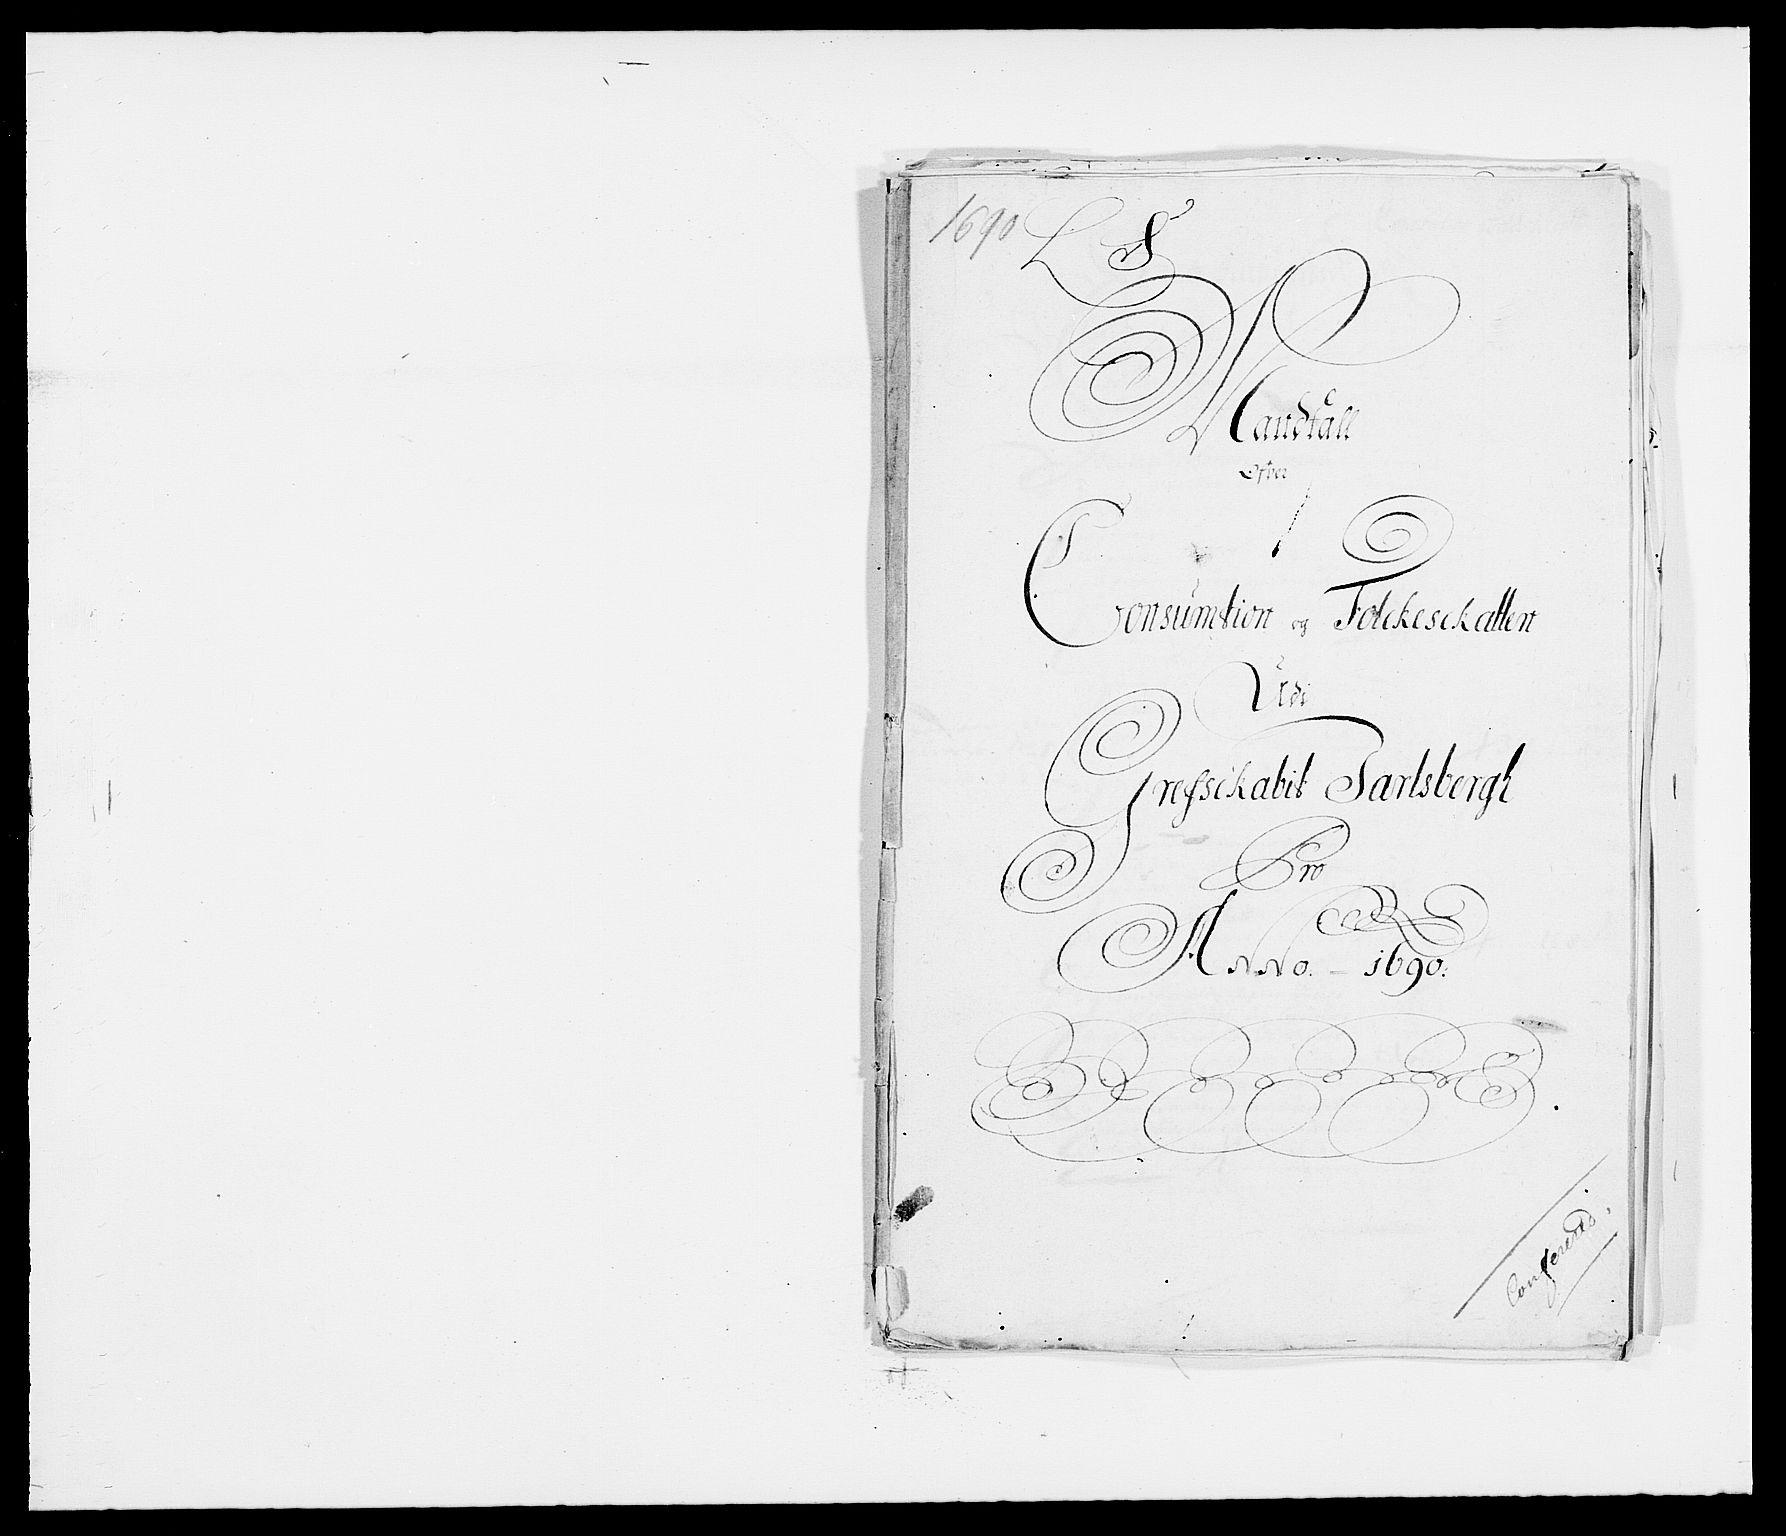 RA, Rentekammeret inntil 1814, Reviderte regnskaper, Fogderegnskap, R32/L1861: Fogderegnskap Jarlsberg grevskap, 1686-1690, s. 309